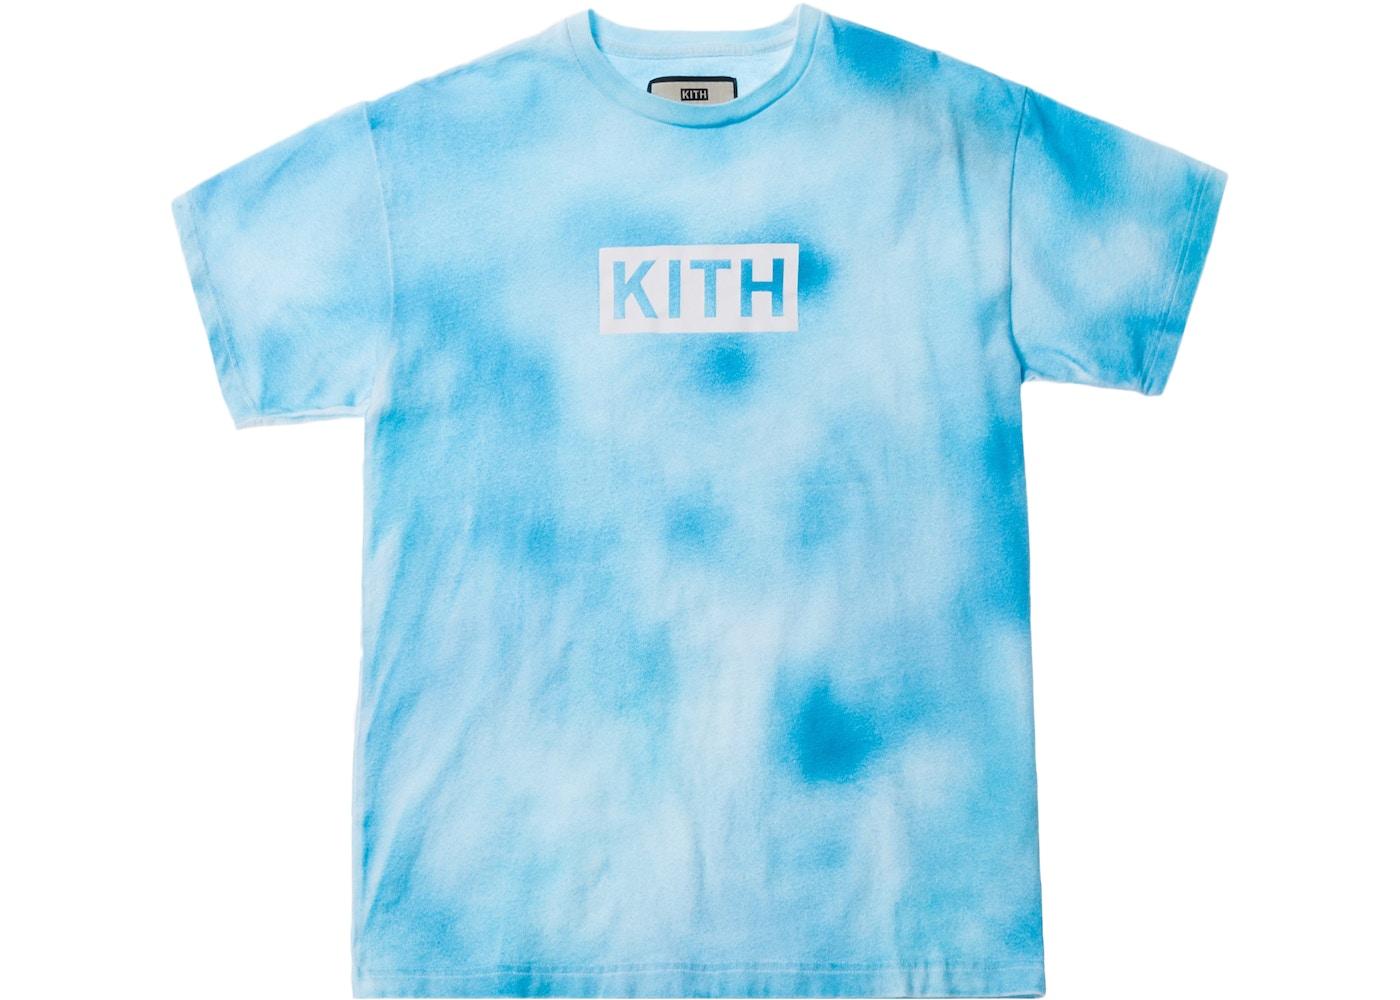 c67c9fa8 Kith Tie Dye Box Logo Tee Blue - SS18